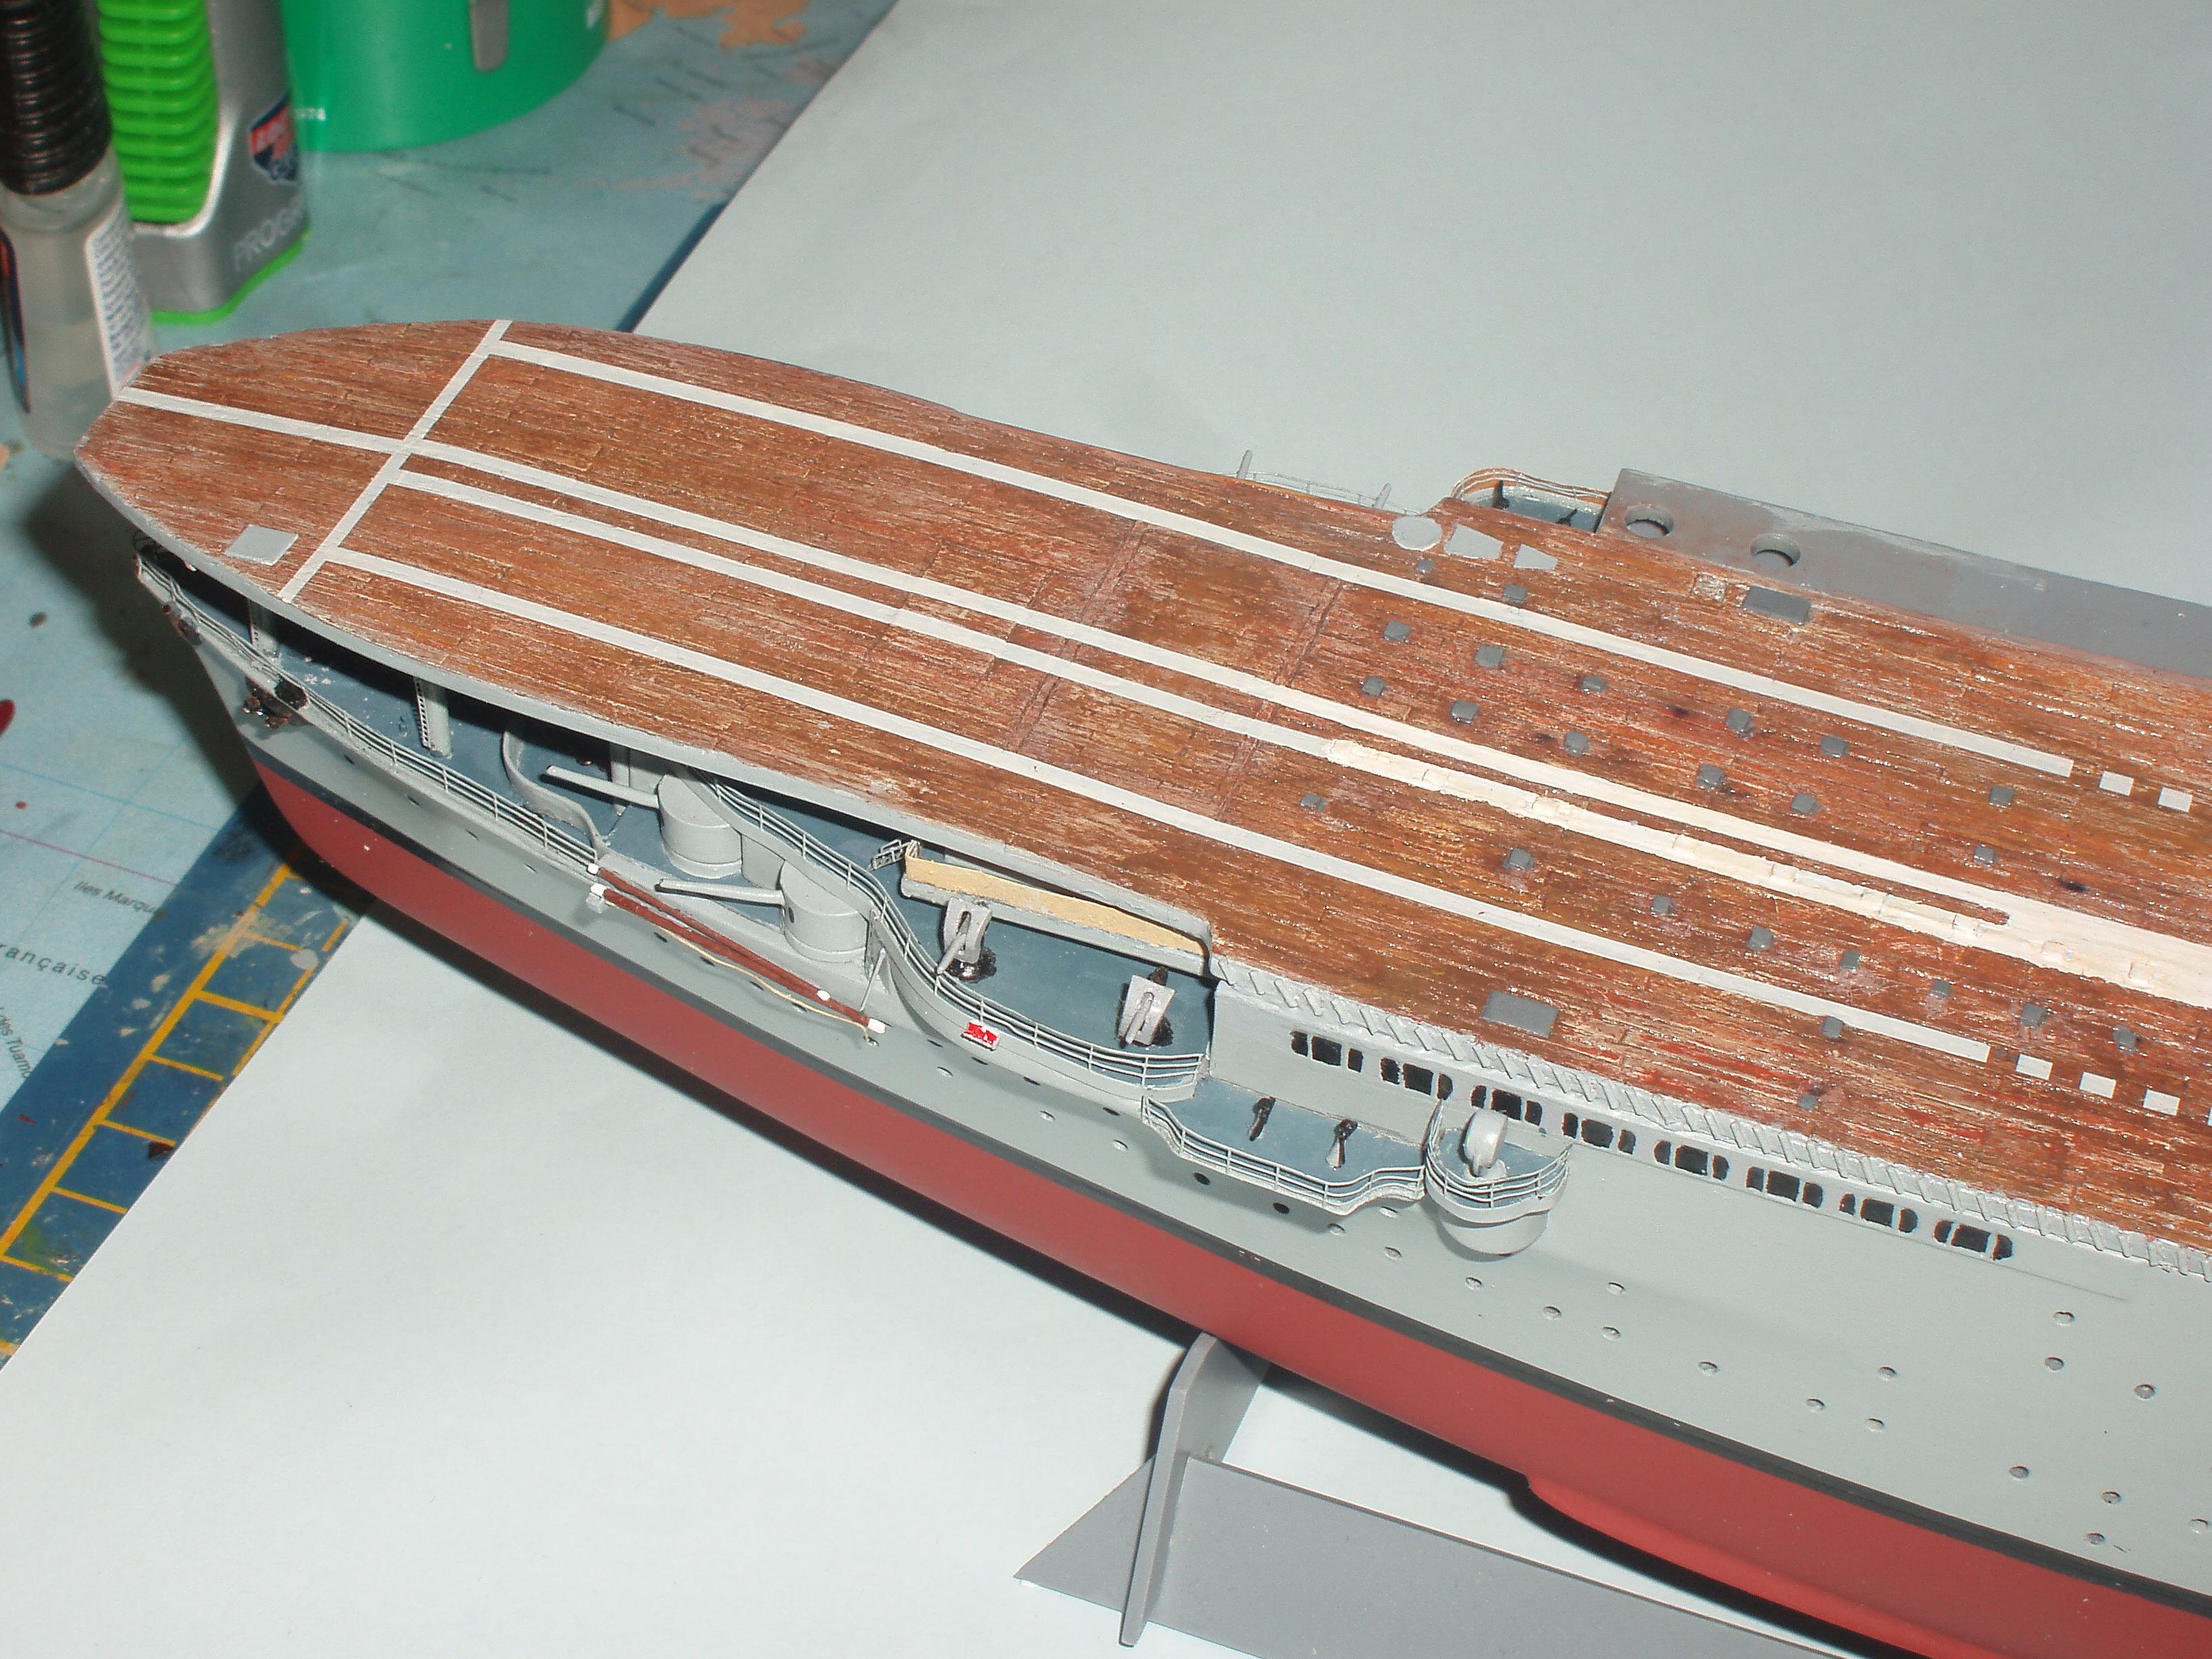 Le porte avions BEARN de l' ARSENAL 123620dio005